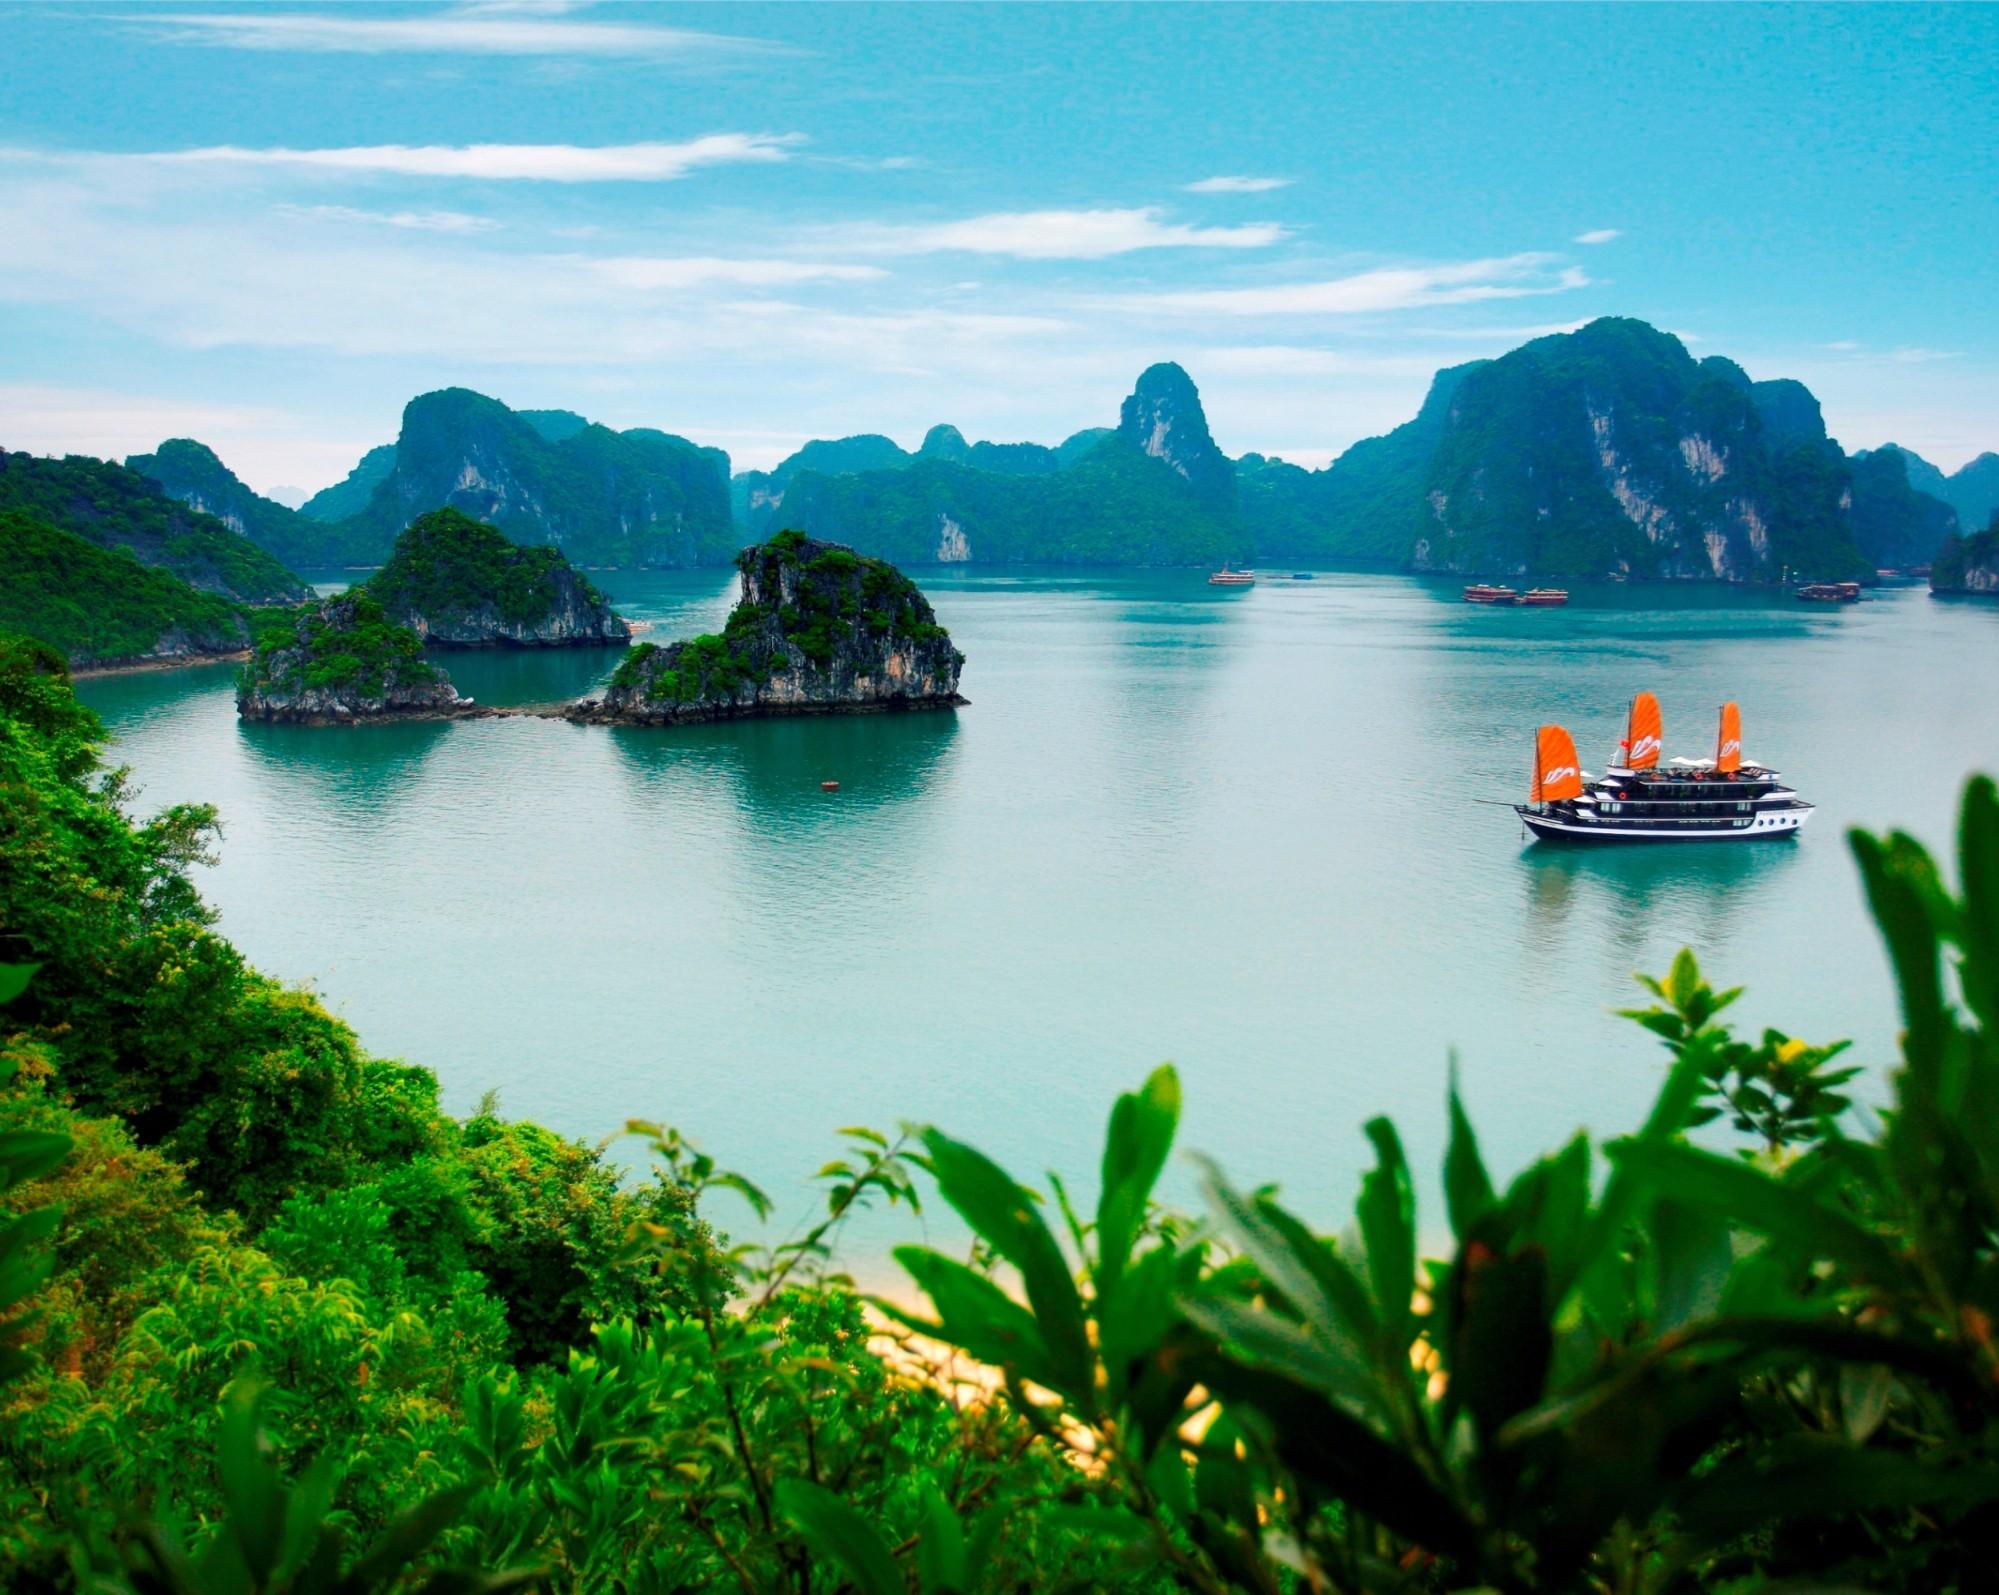 Отдых во Вьетнаме в отеле LAM MY HOTEL 3* от 65000 рублей